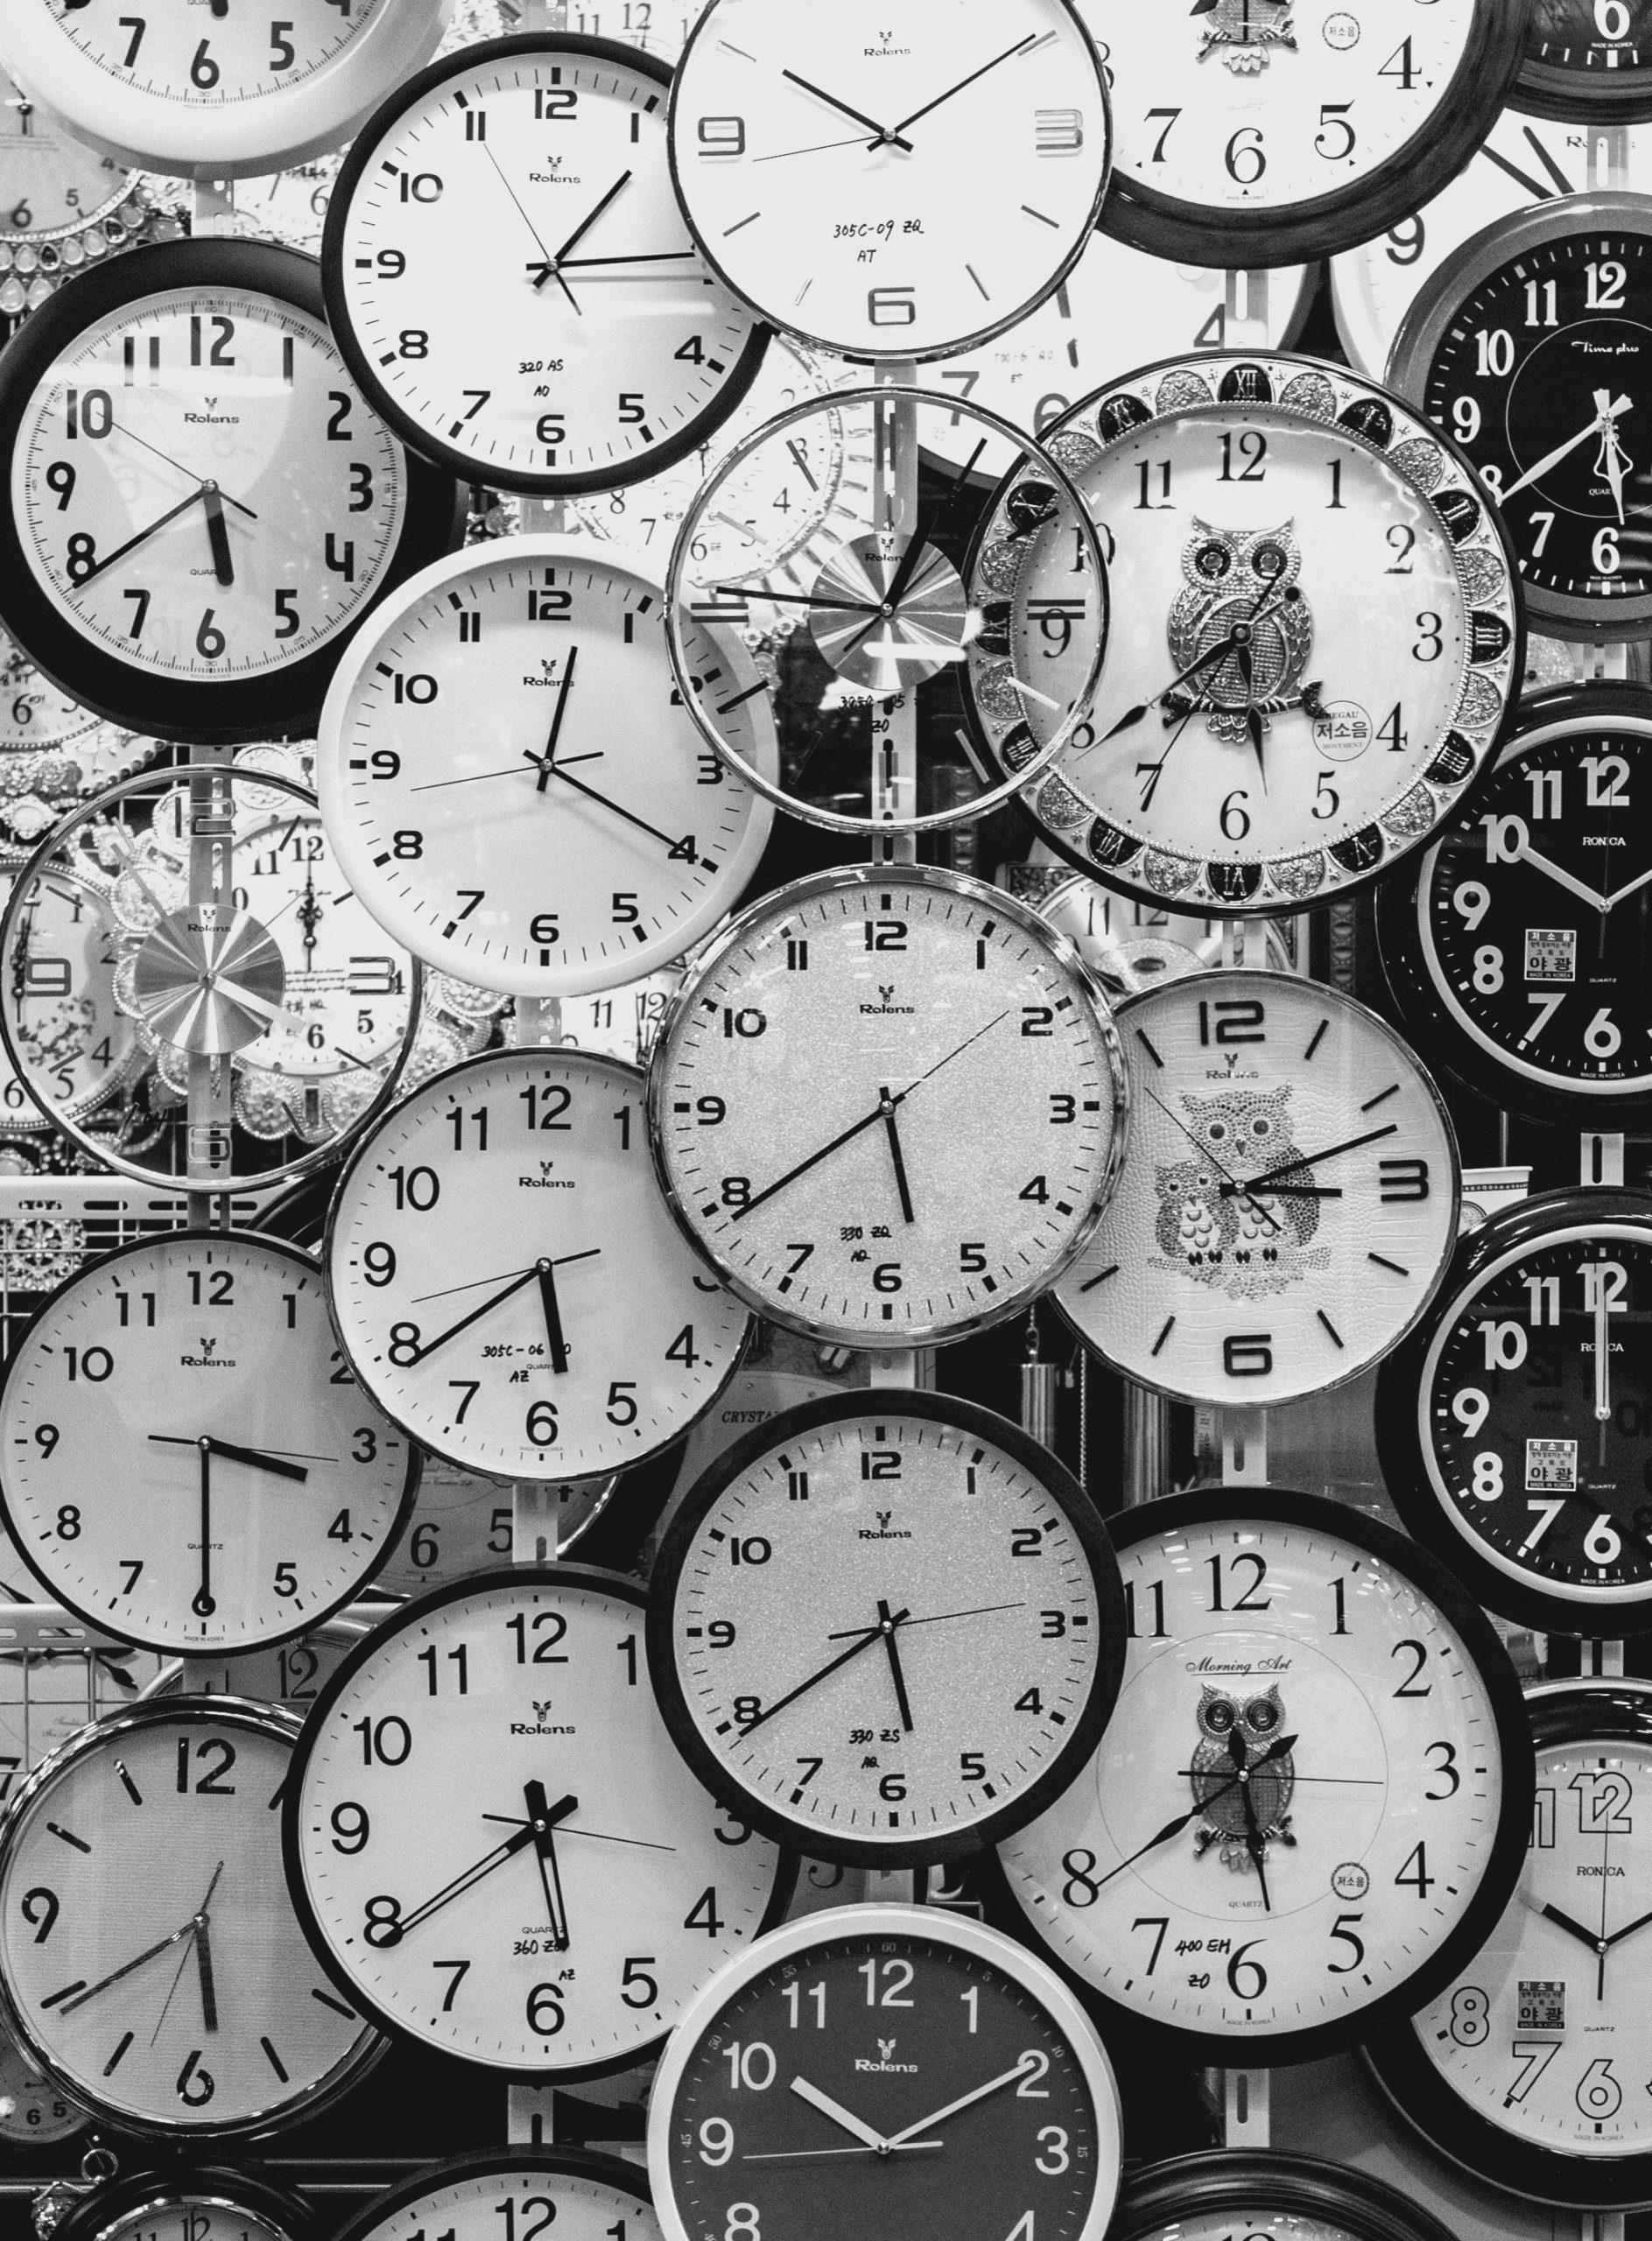 Workforce Management and Scheduling